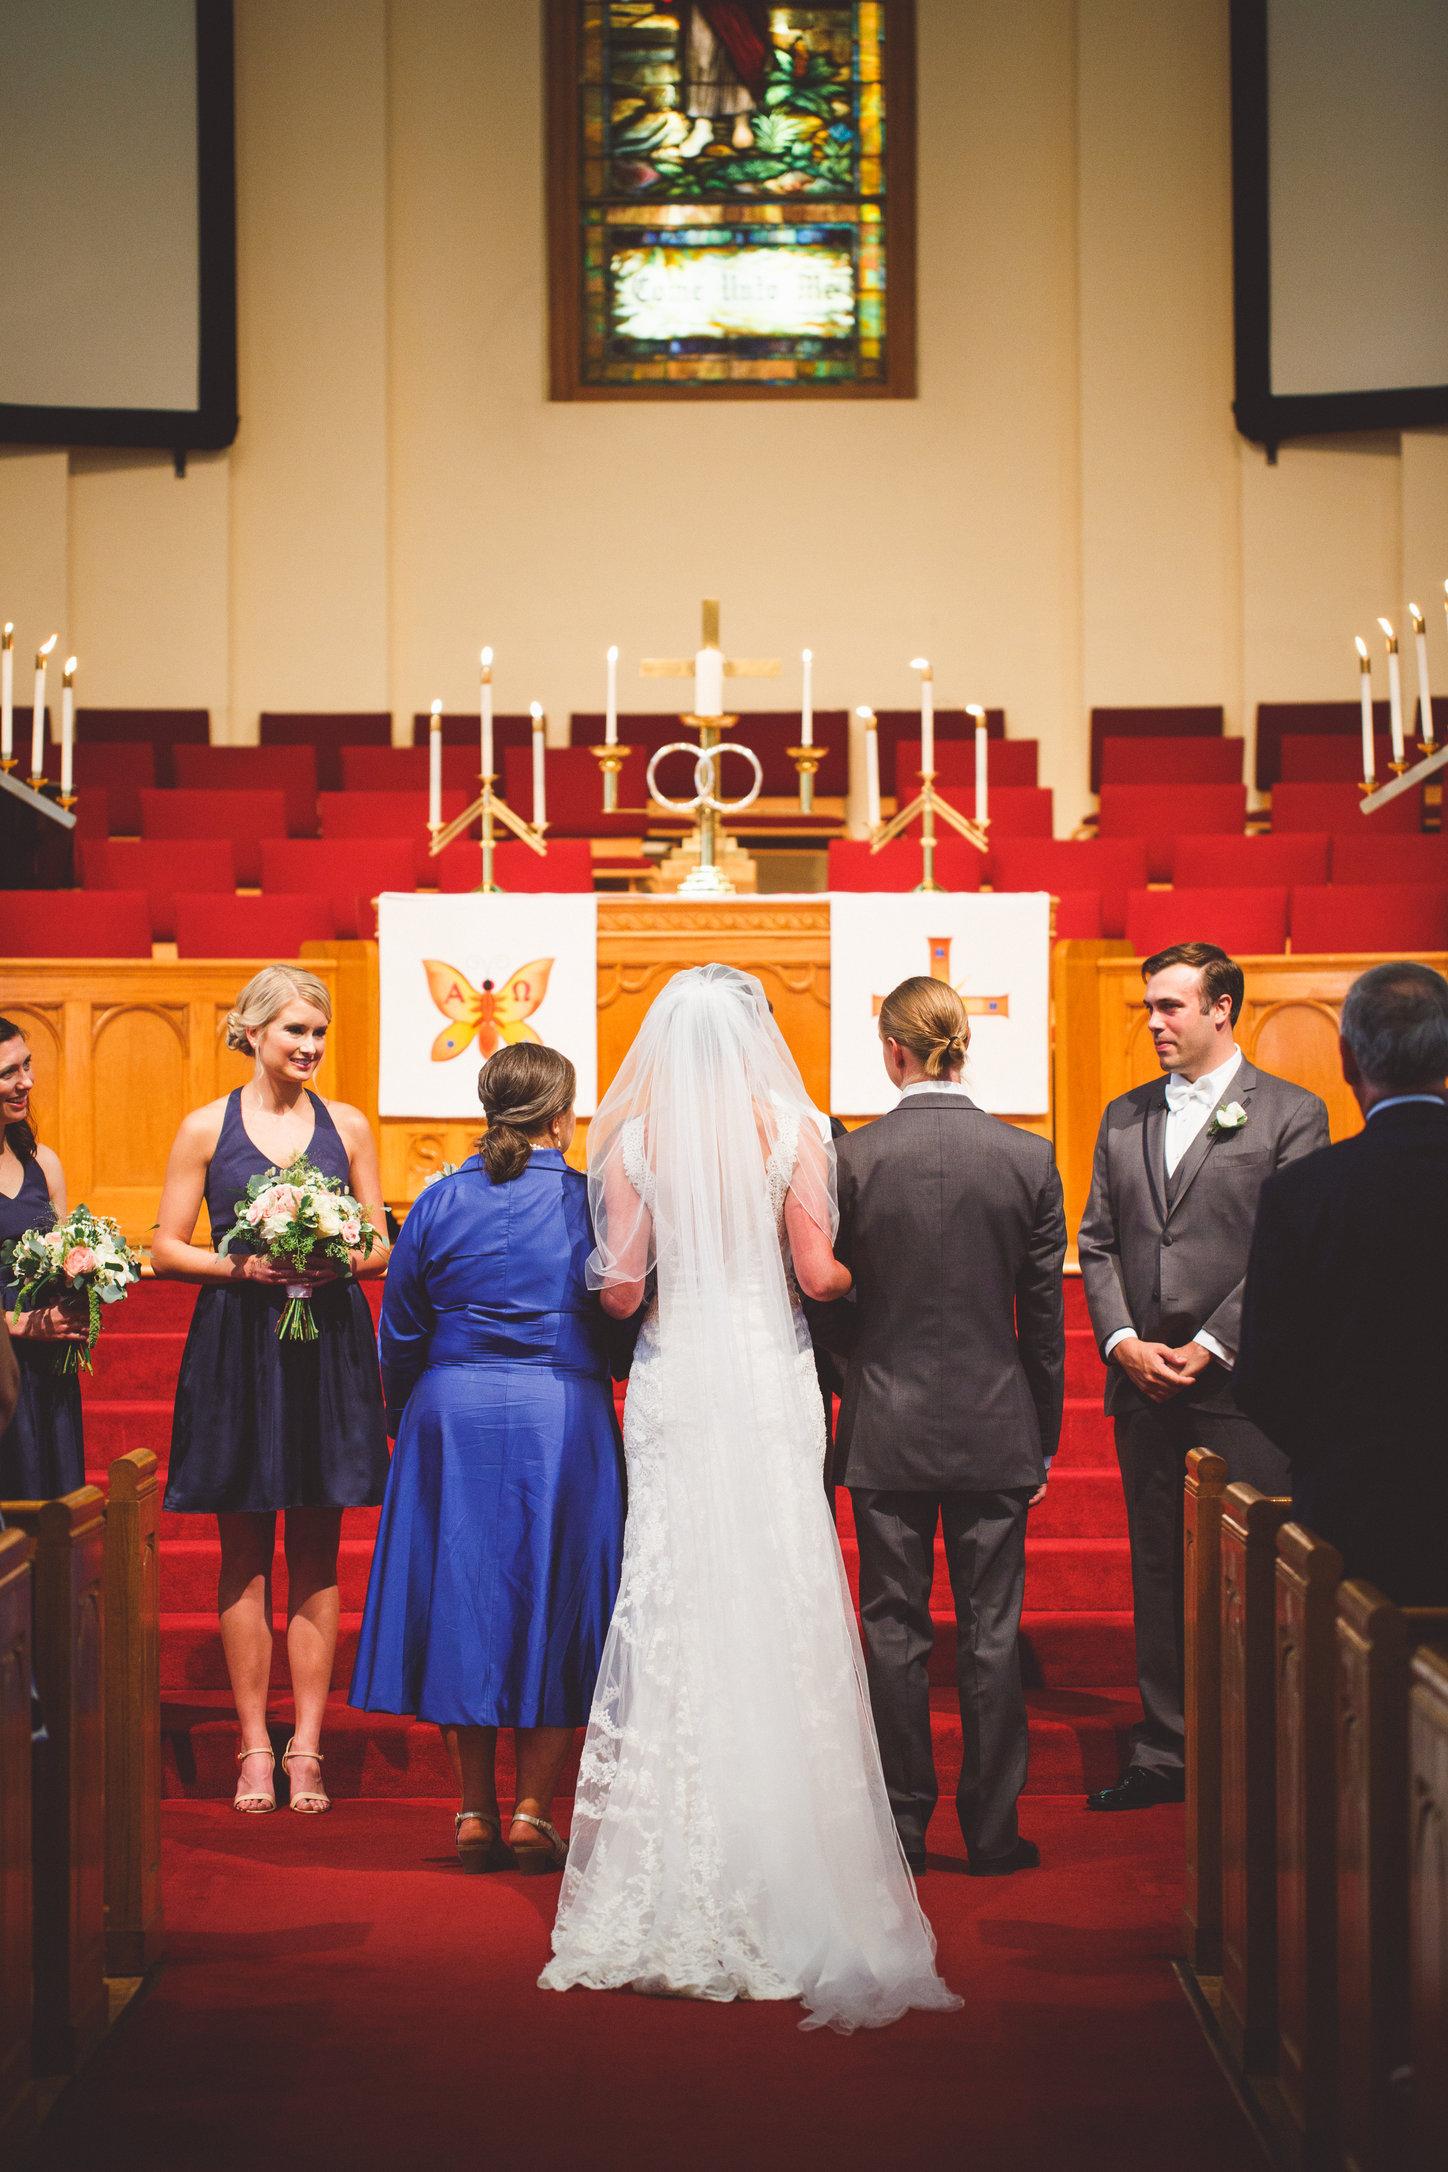 SandC-wedding-173.jpg